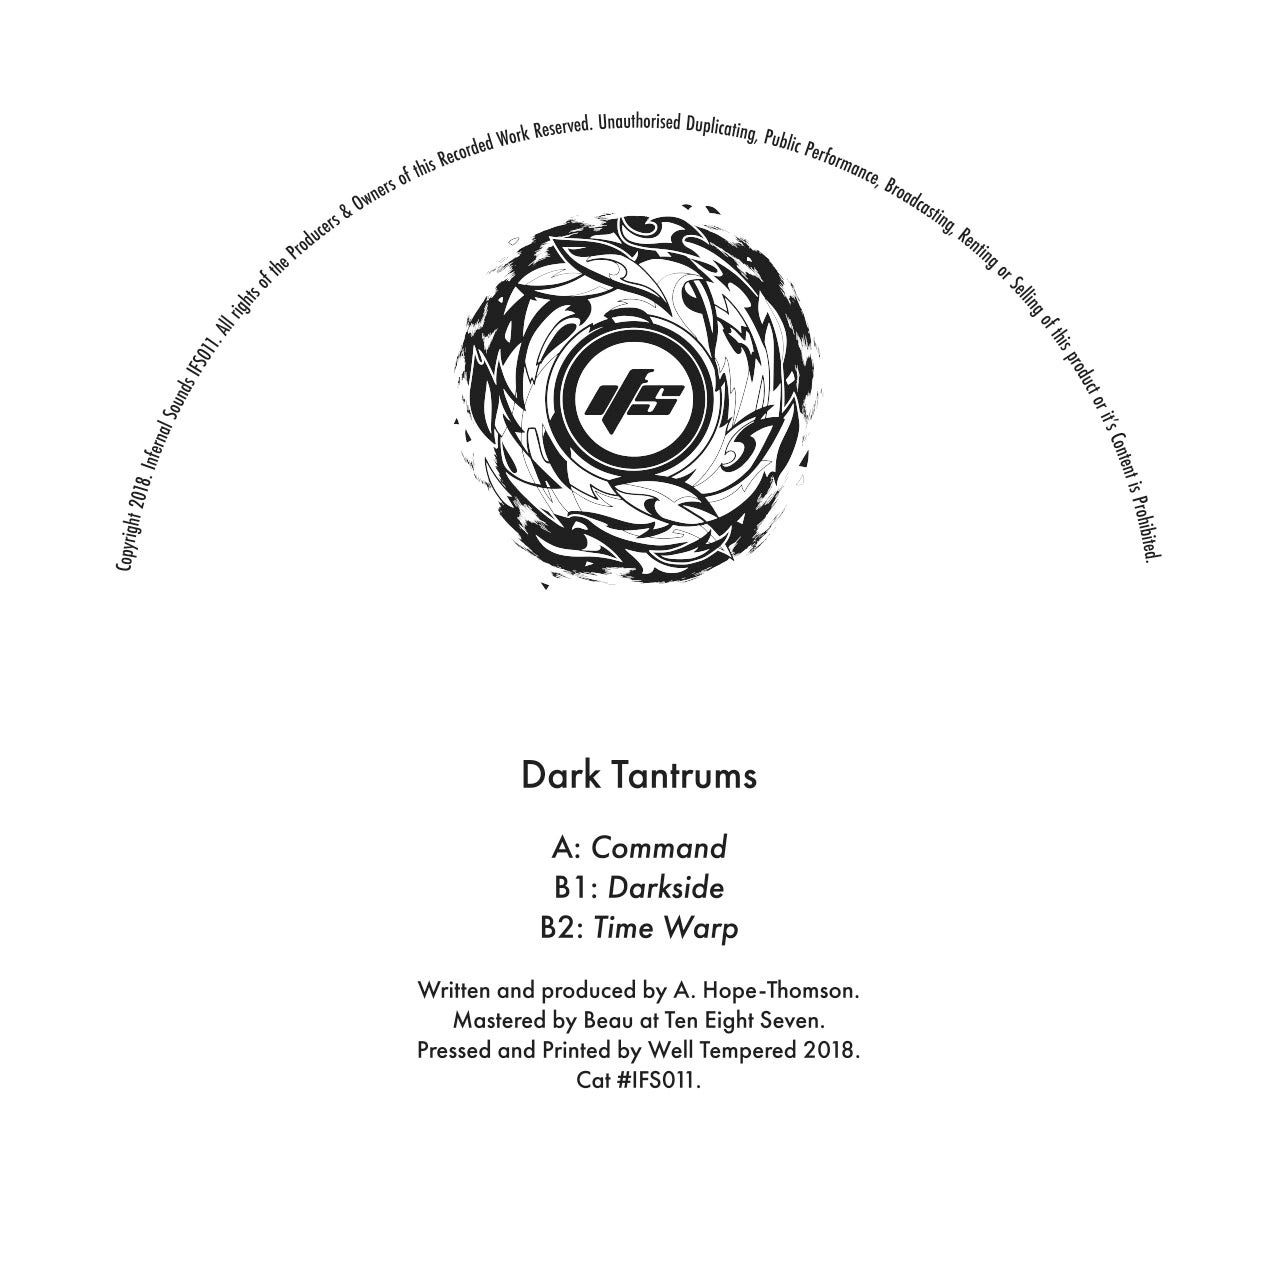 Image of IFS011: Dark Tantrums - Command / Darkside / Time Warp (20% OFF)